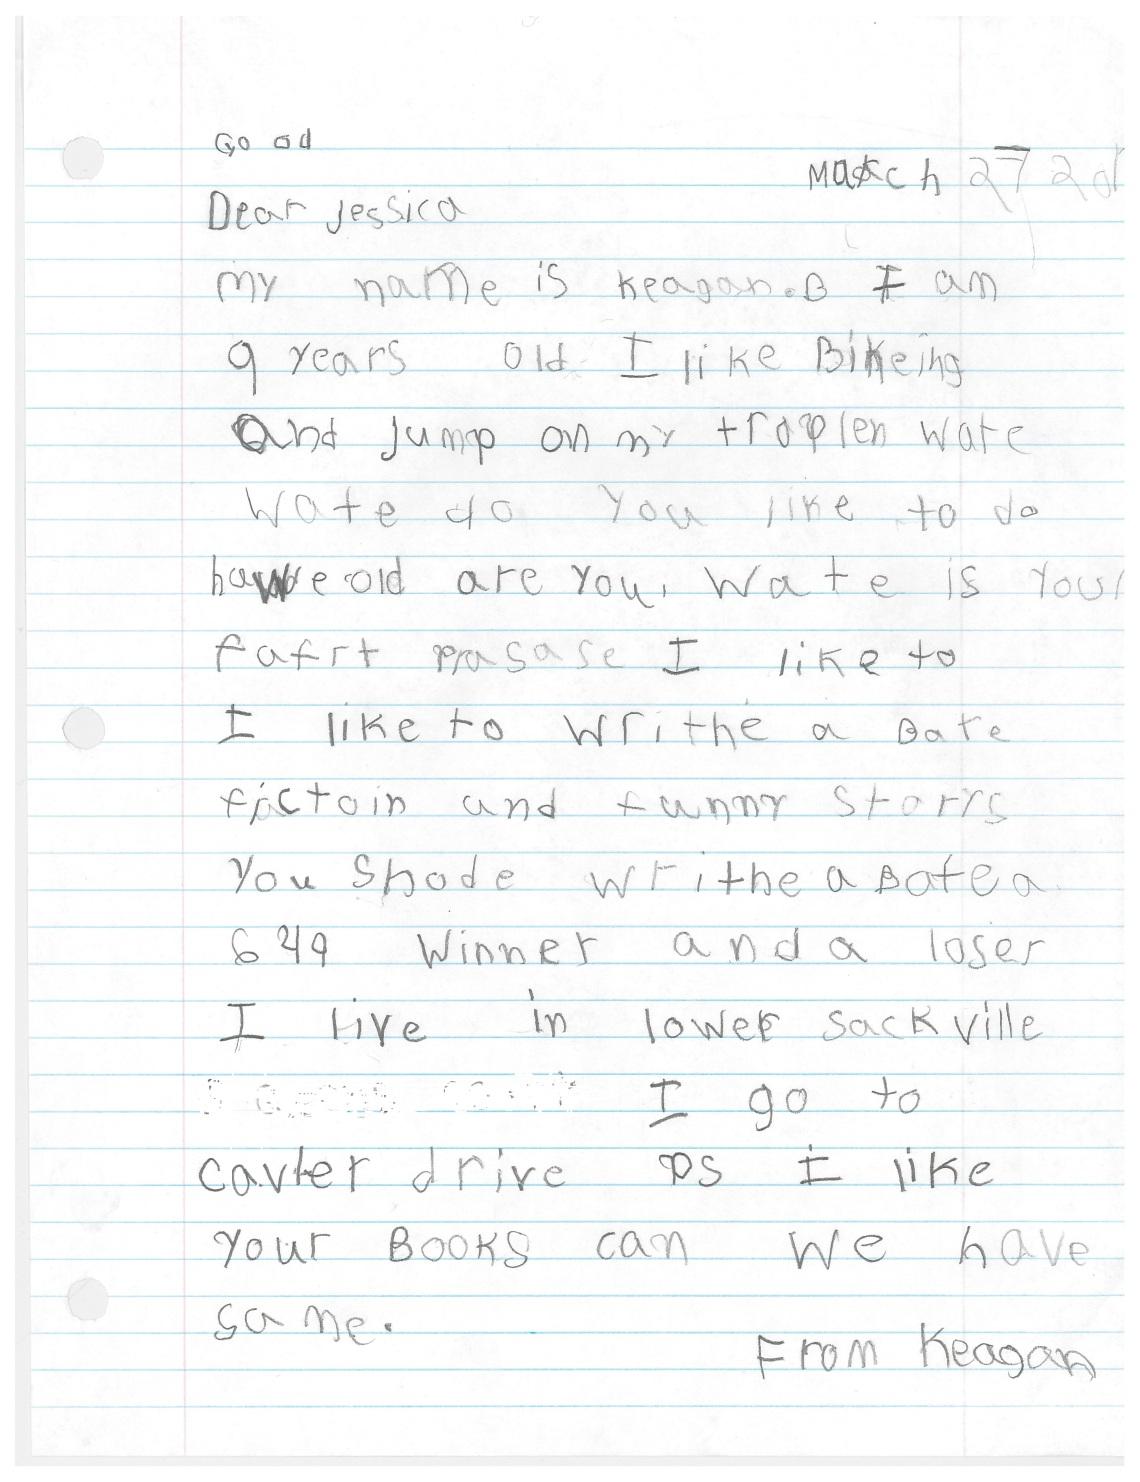 20120428-Keagan-letter-Cavalier-Dr-WITS